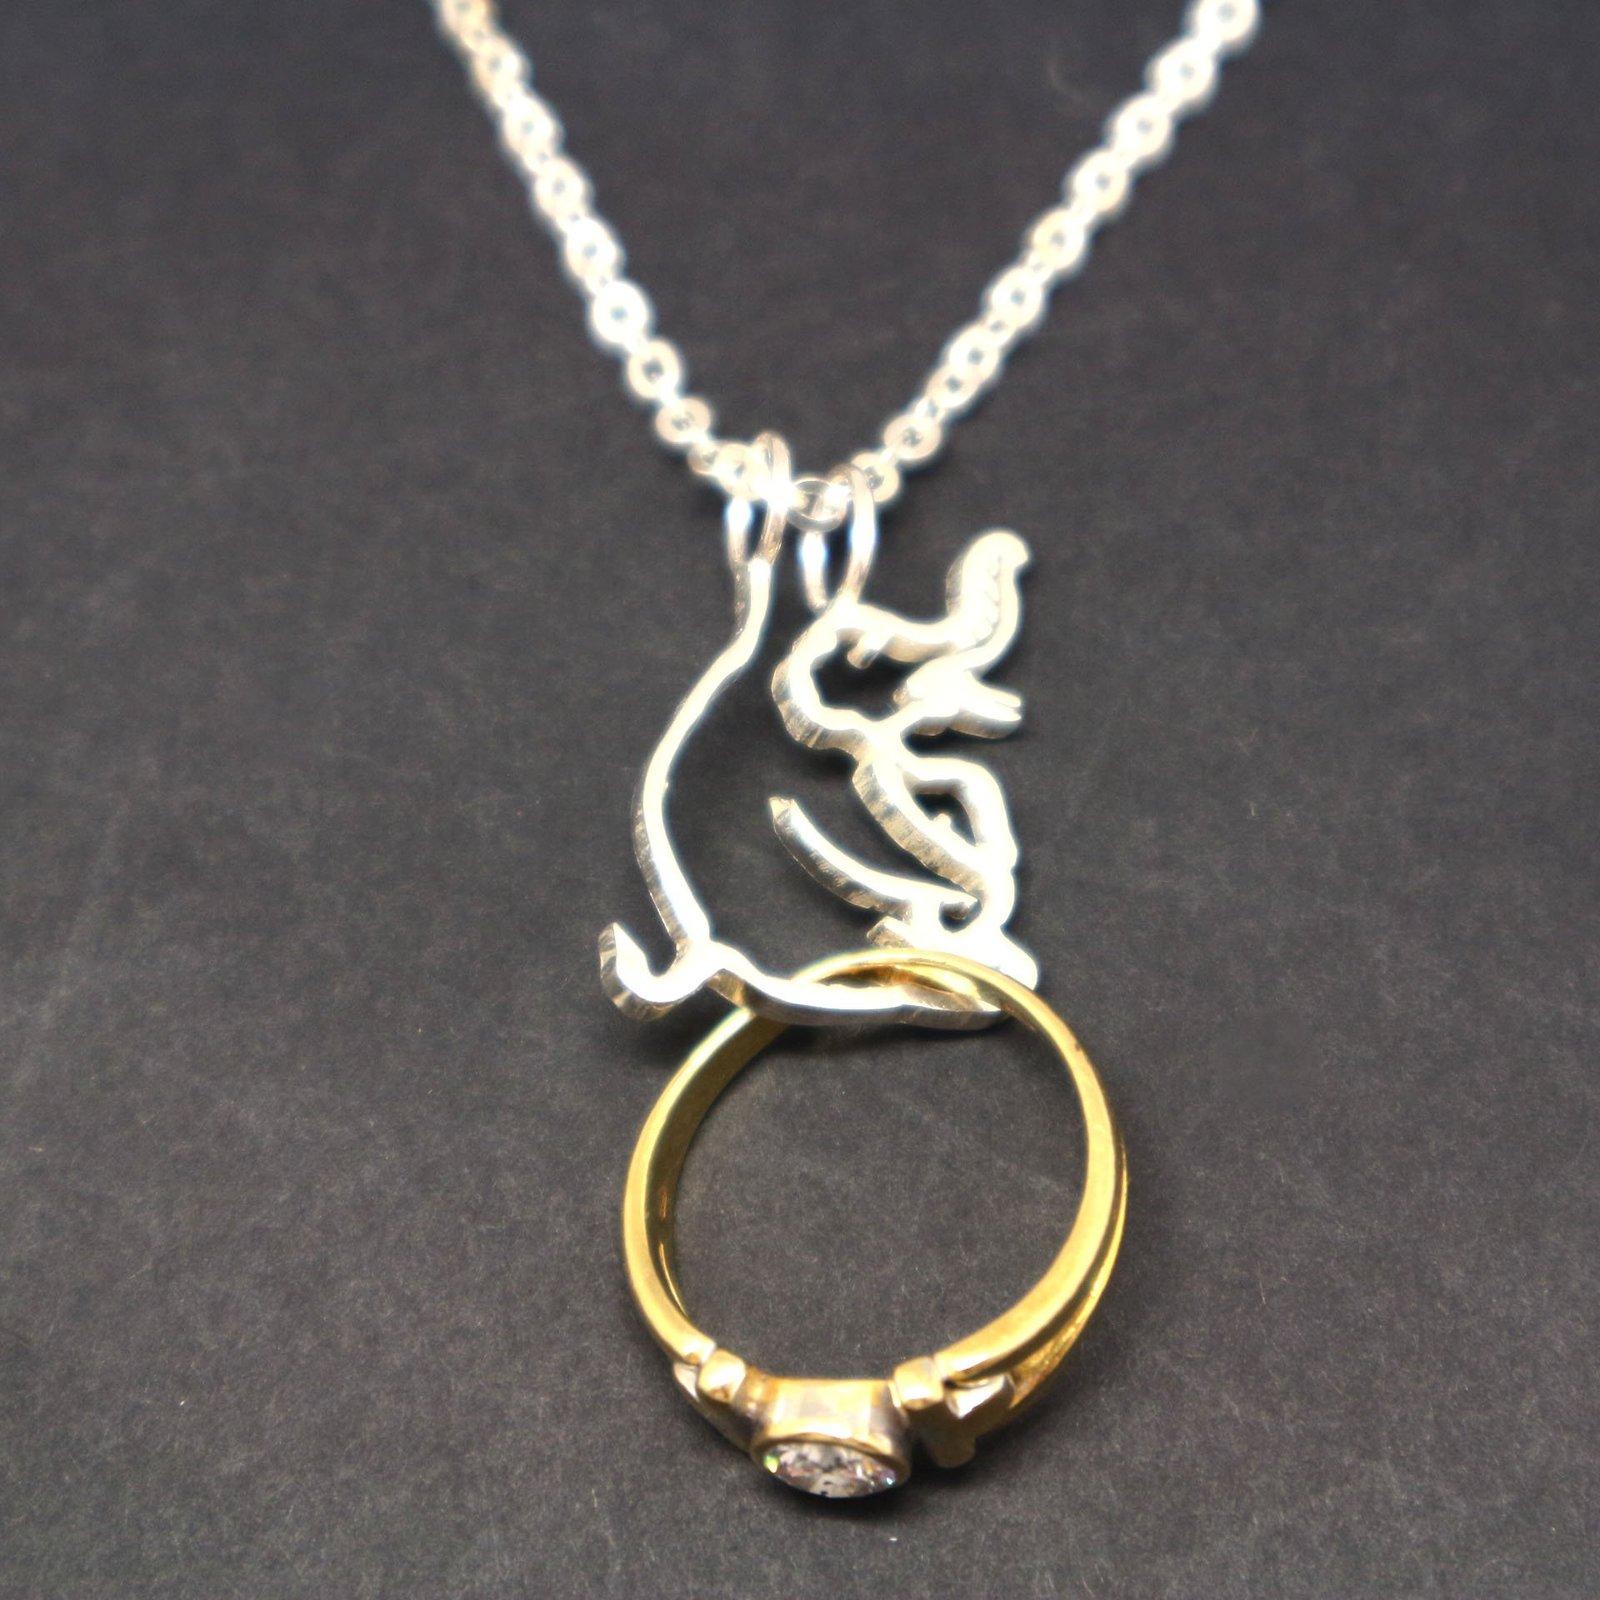 Silver Elephant Ring Holder Necklace Pendant image 6